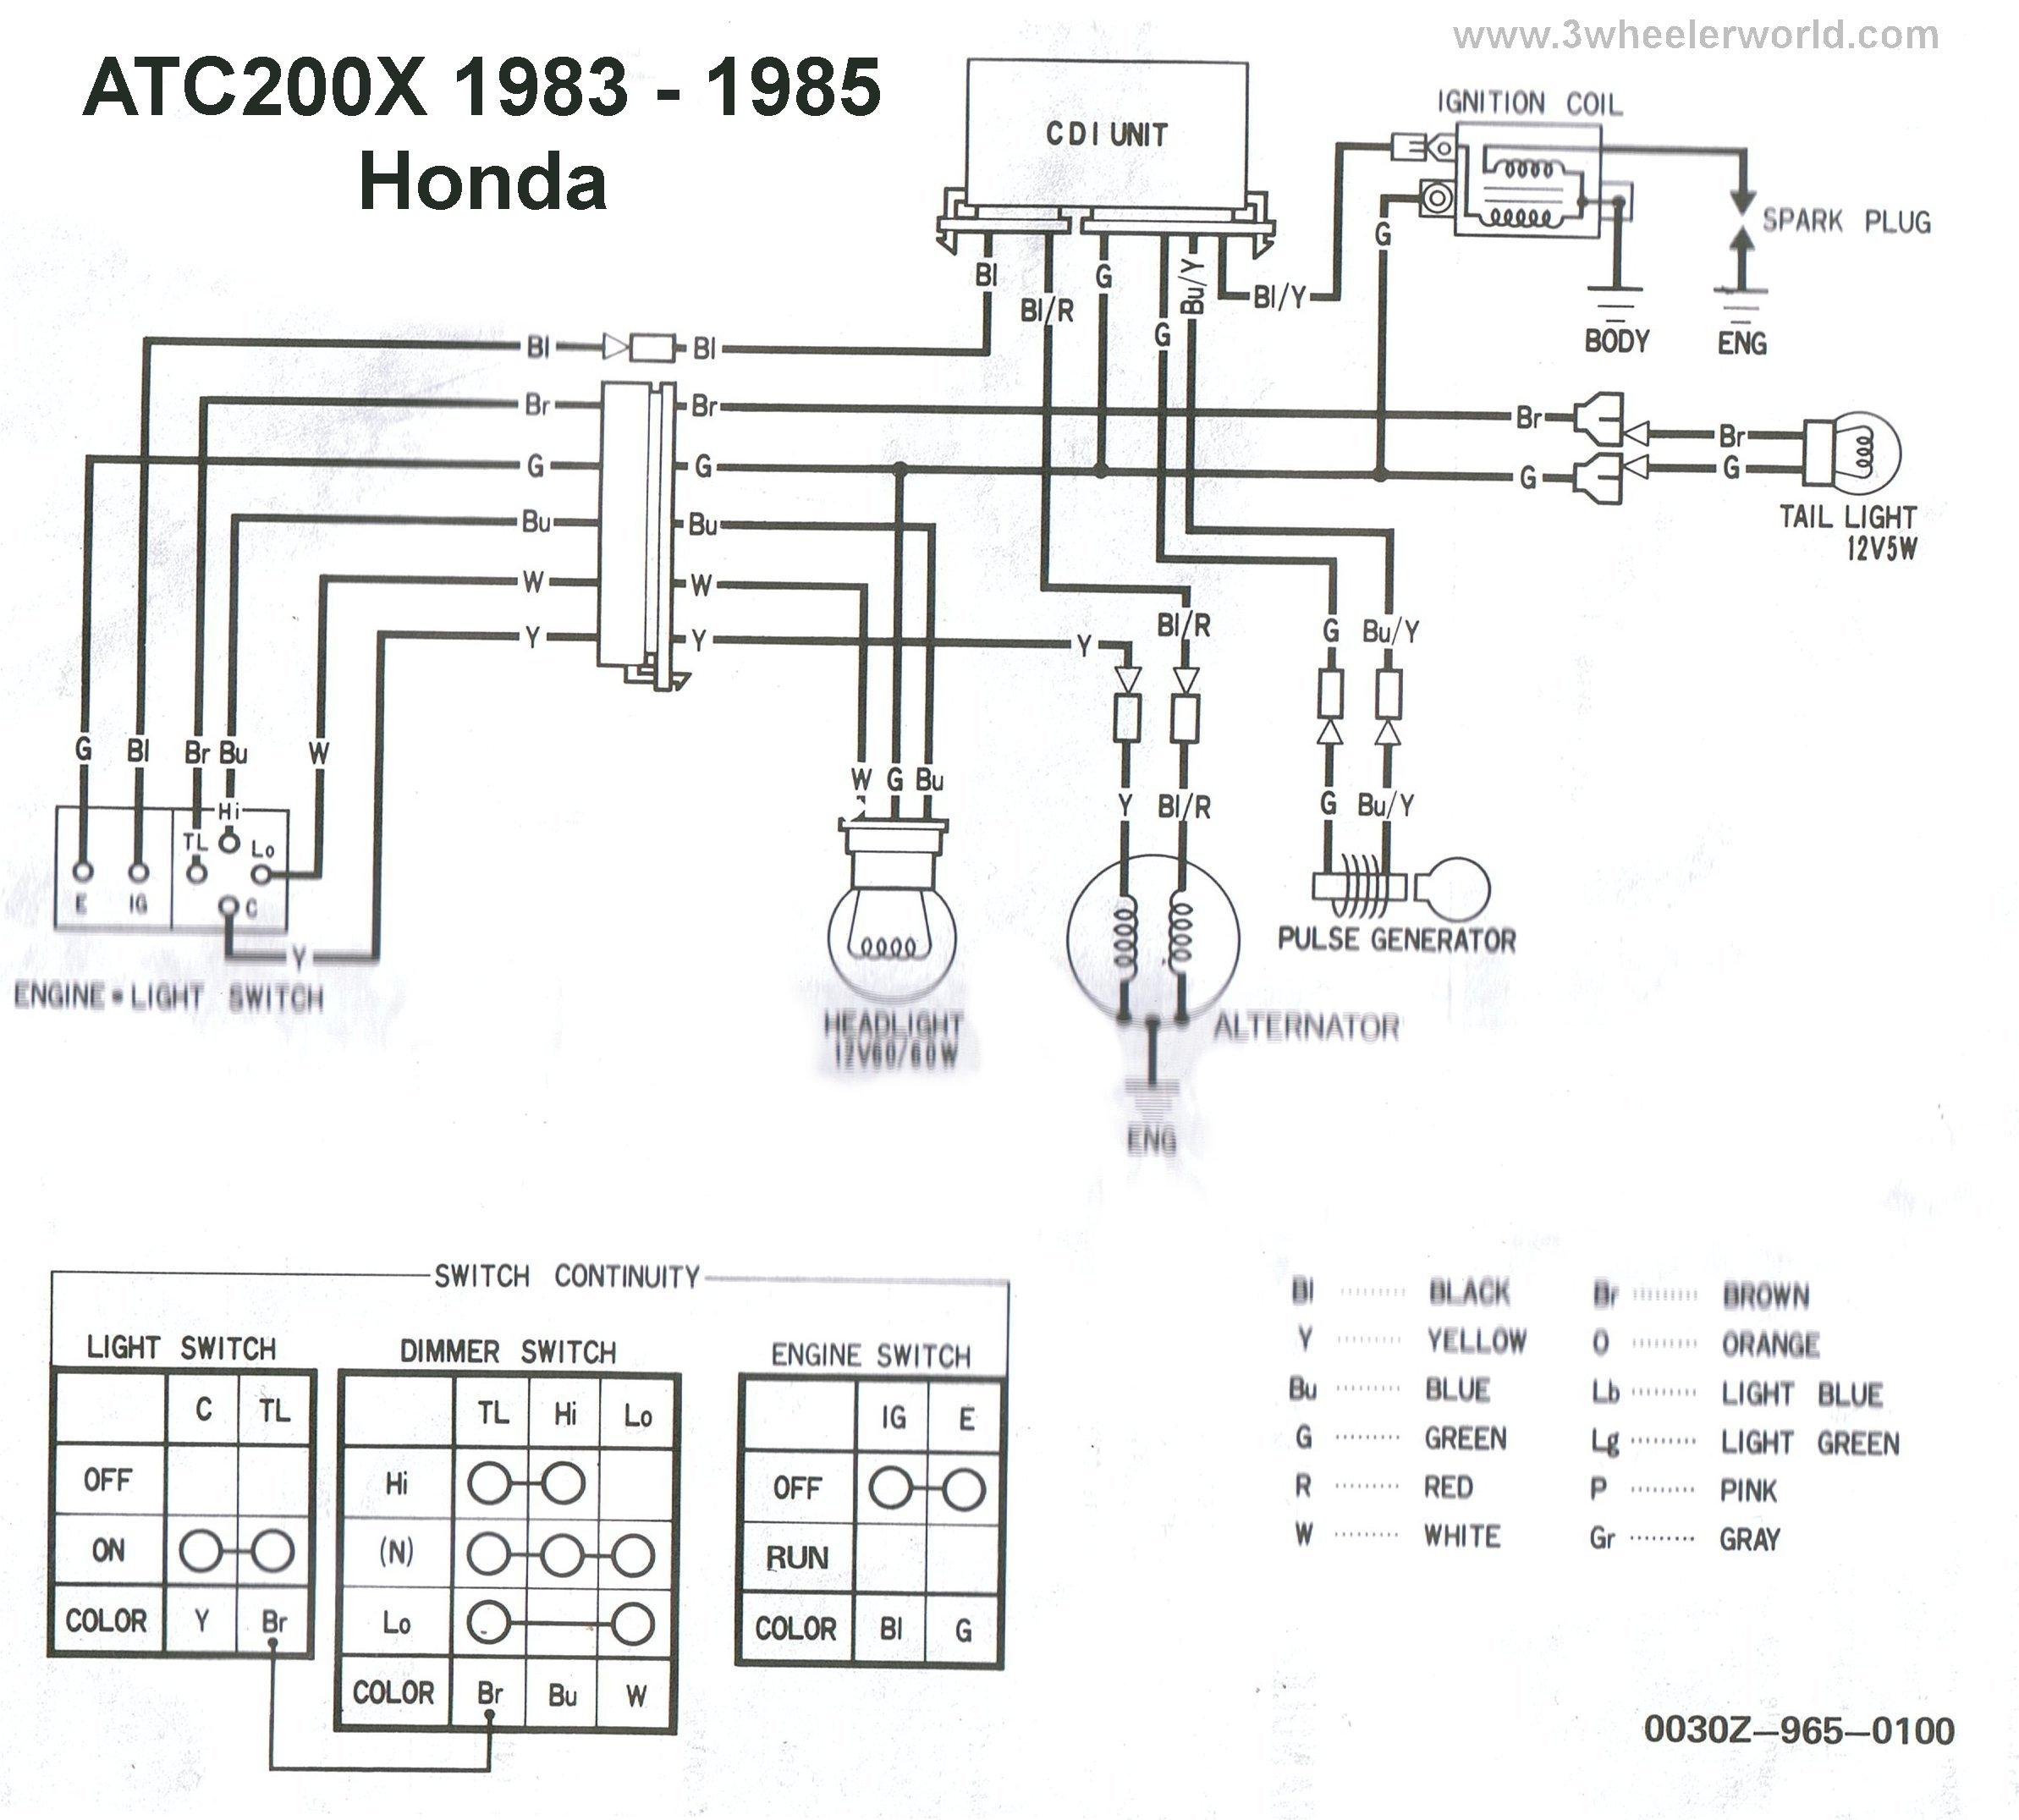 591 1990 honda cdi wiring - auto electrical wiring diagram | wiring library  wiring library